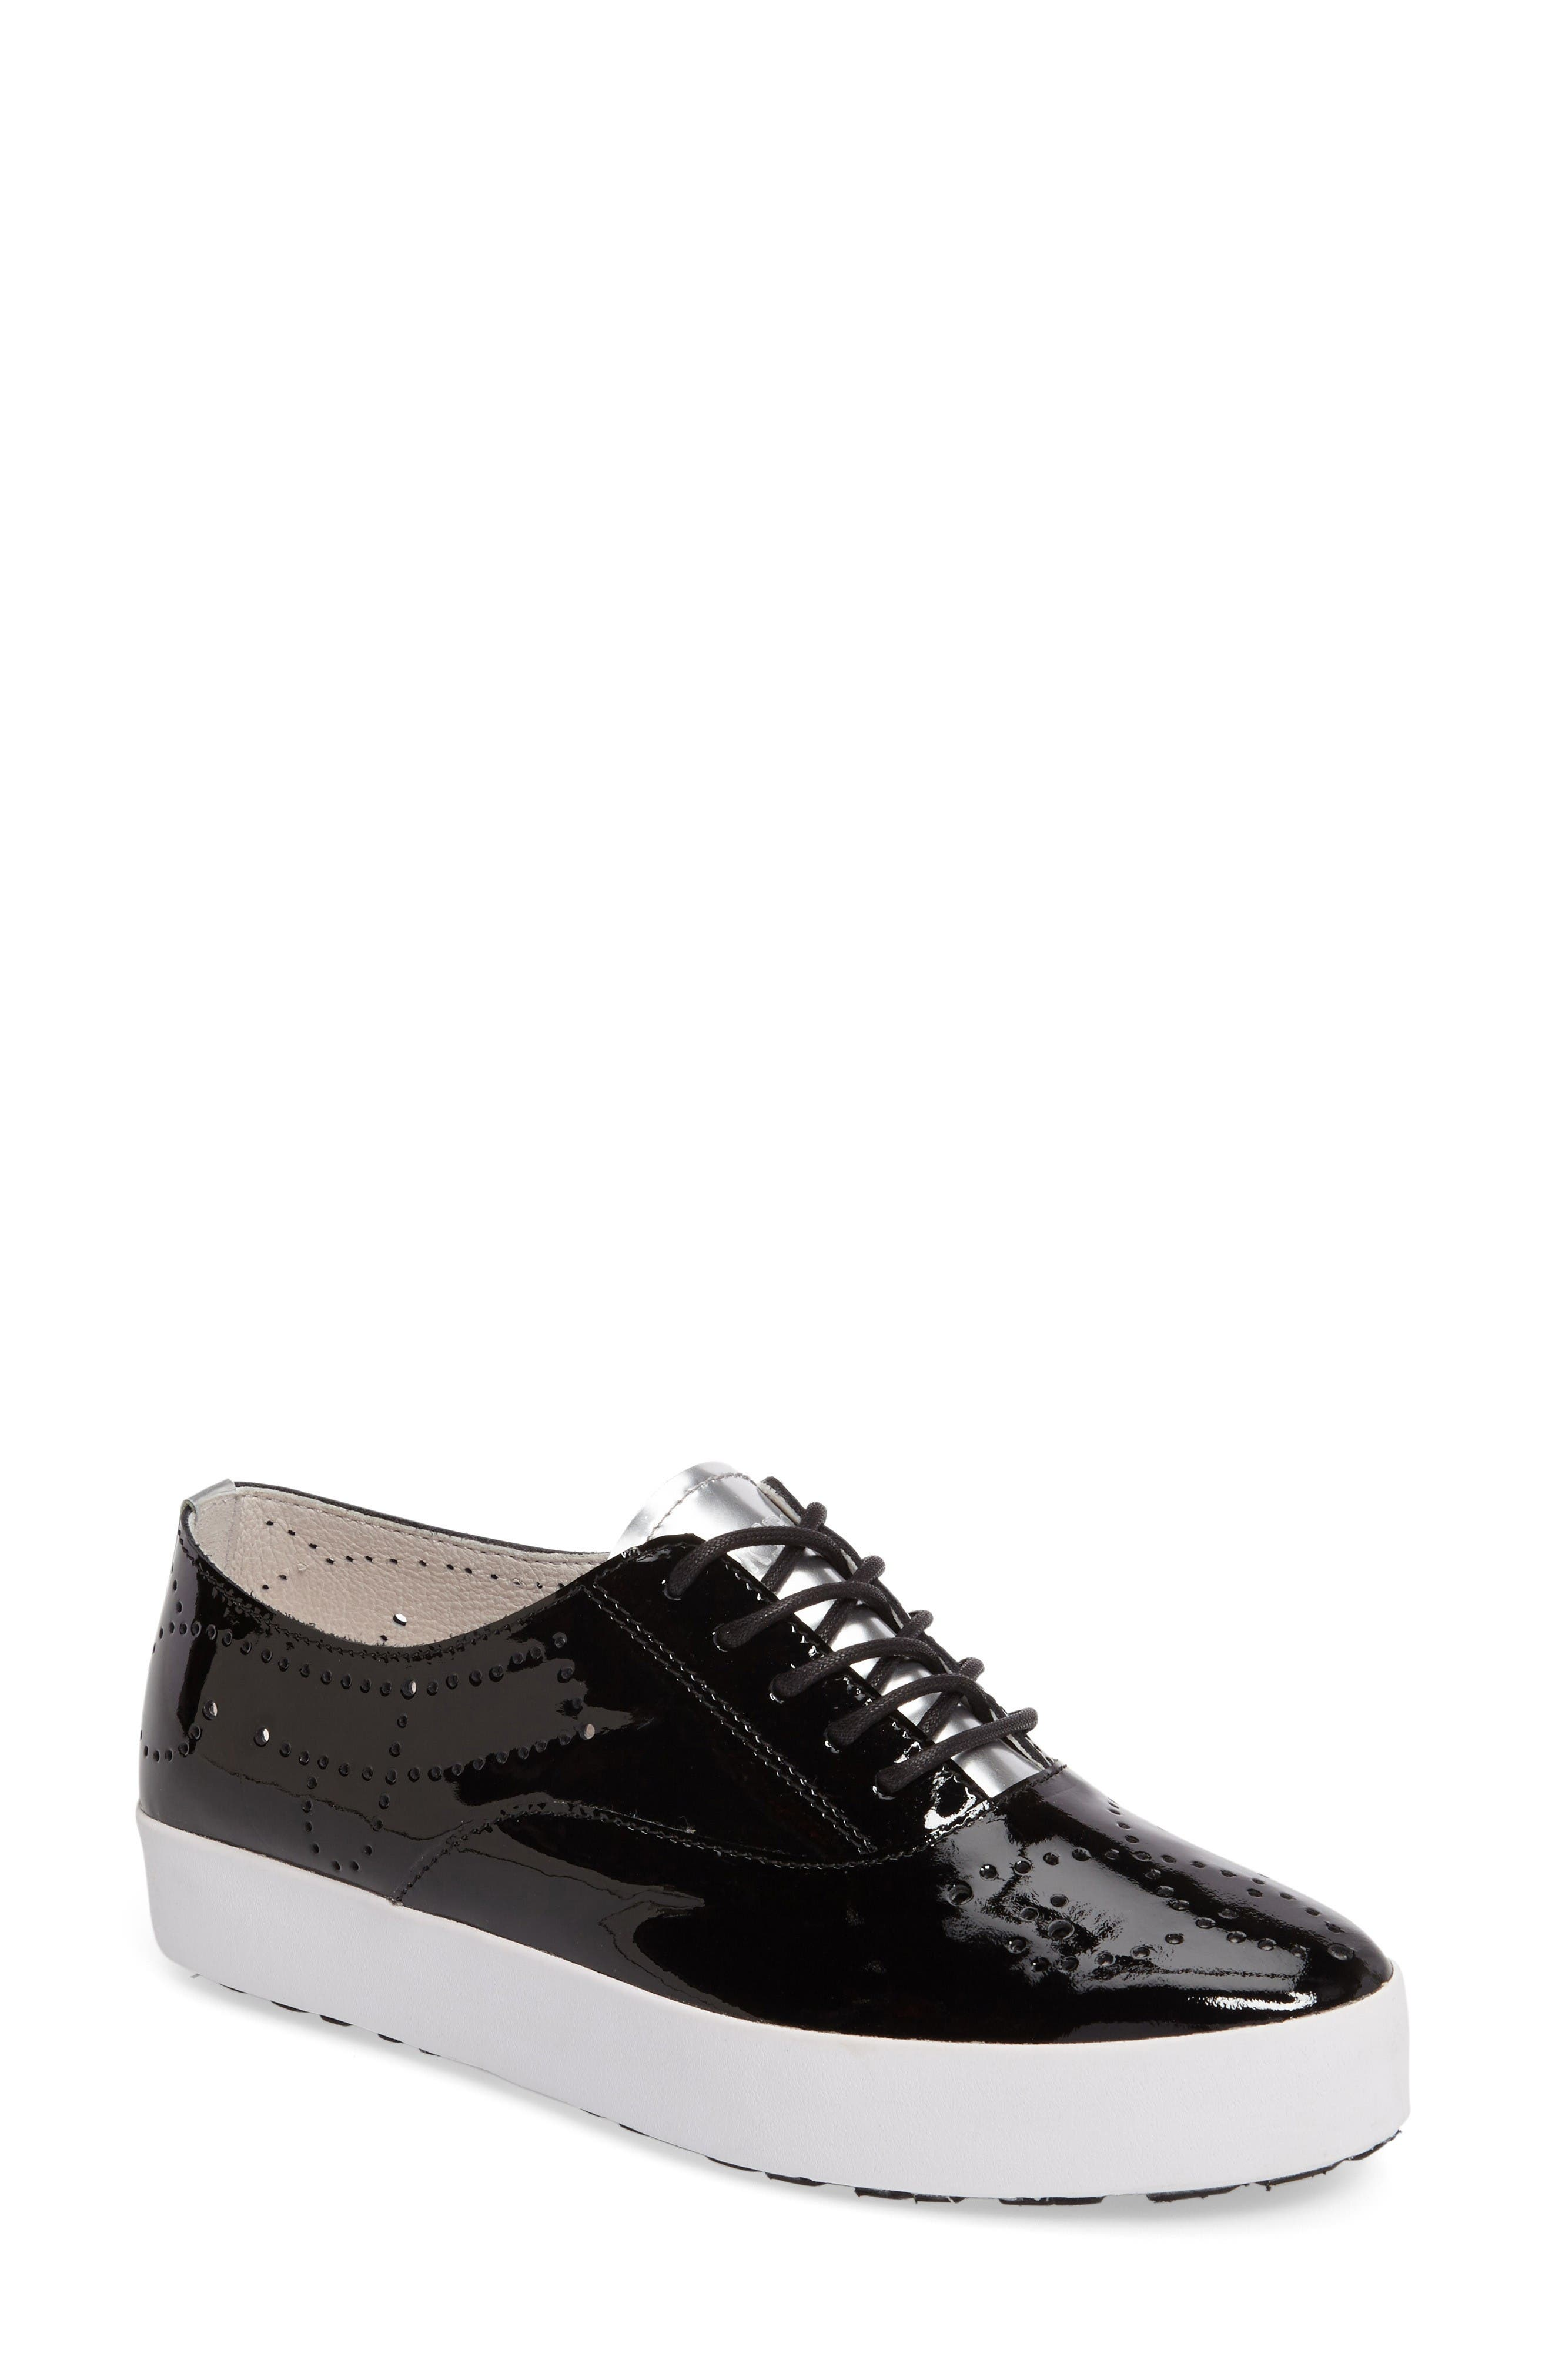 Alternate Image 1 Selected - Blackstone NL41 Sneaker (Women)